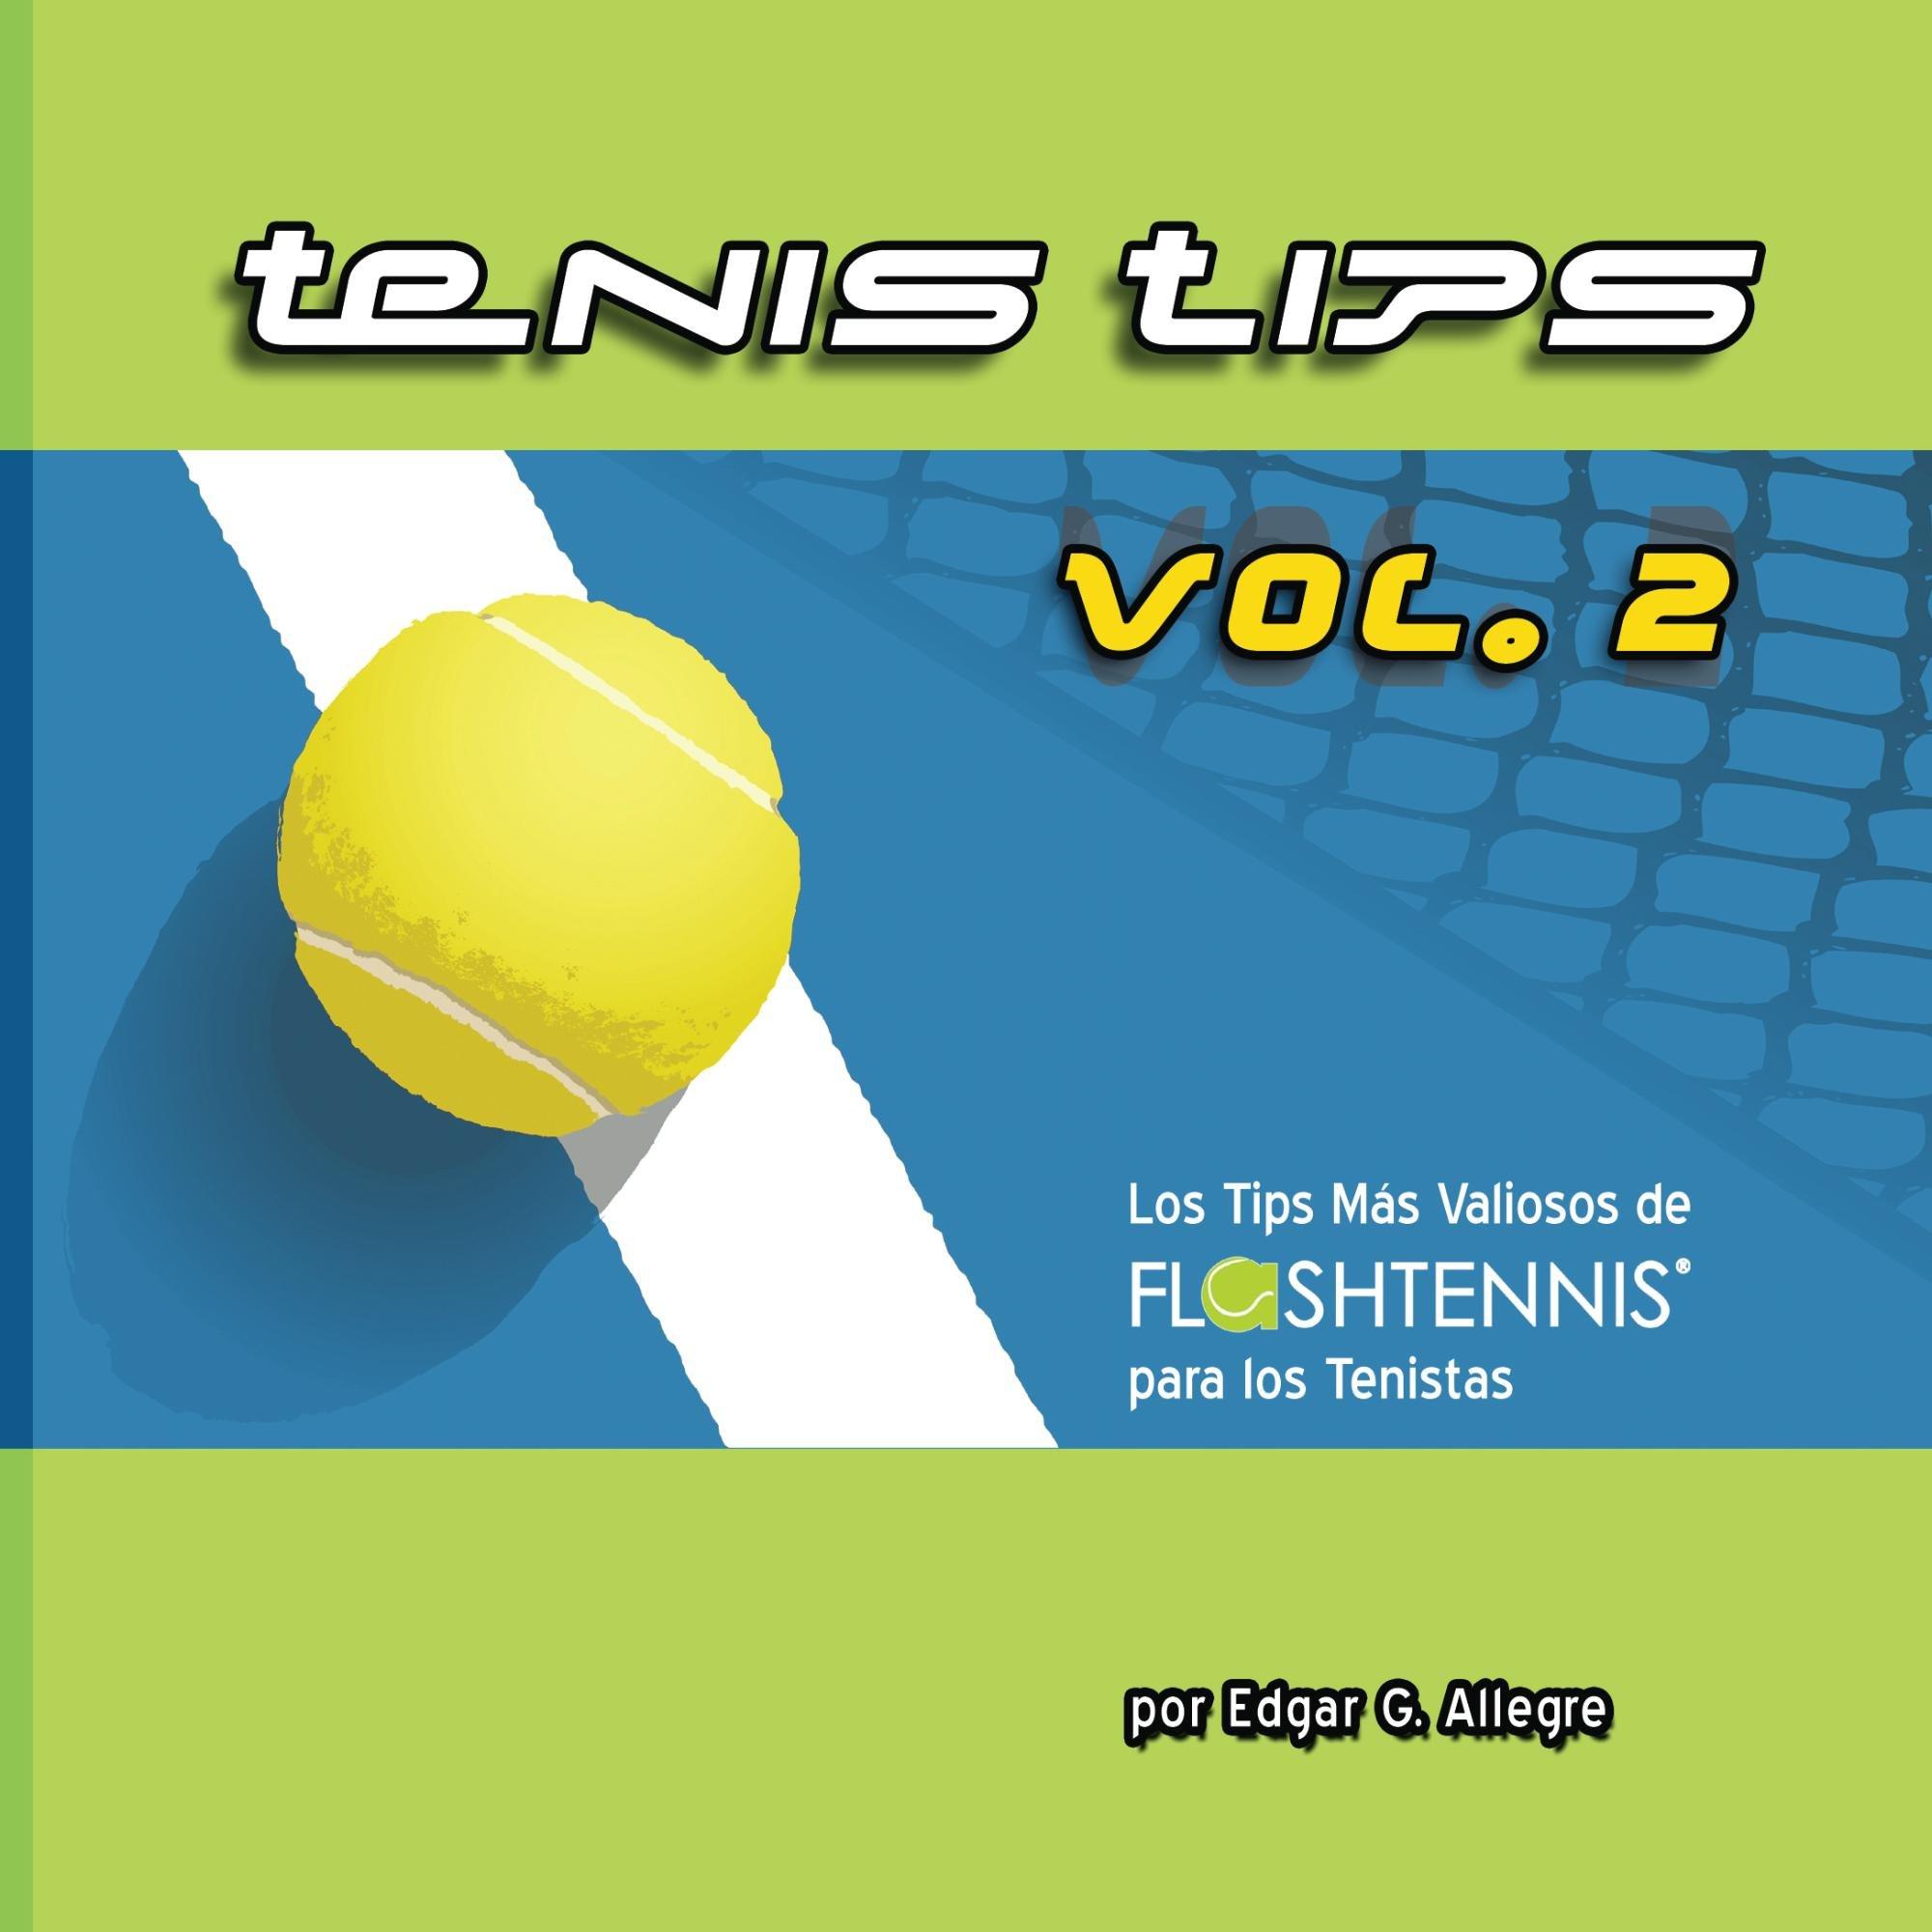 Tenis Tips Vol. 2: Los mejores TIPS de tenis de Flashtennis